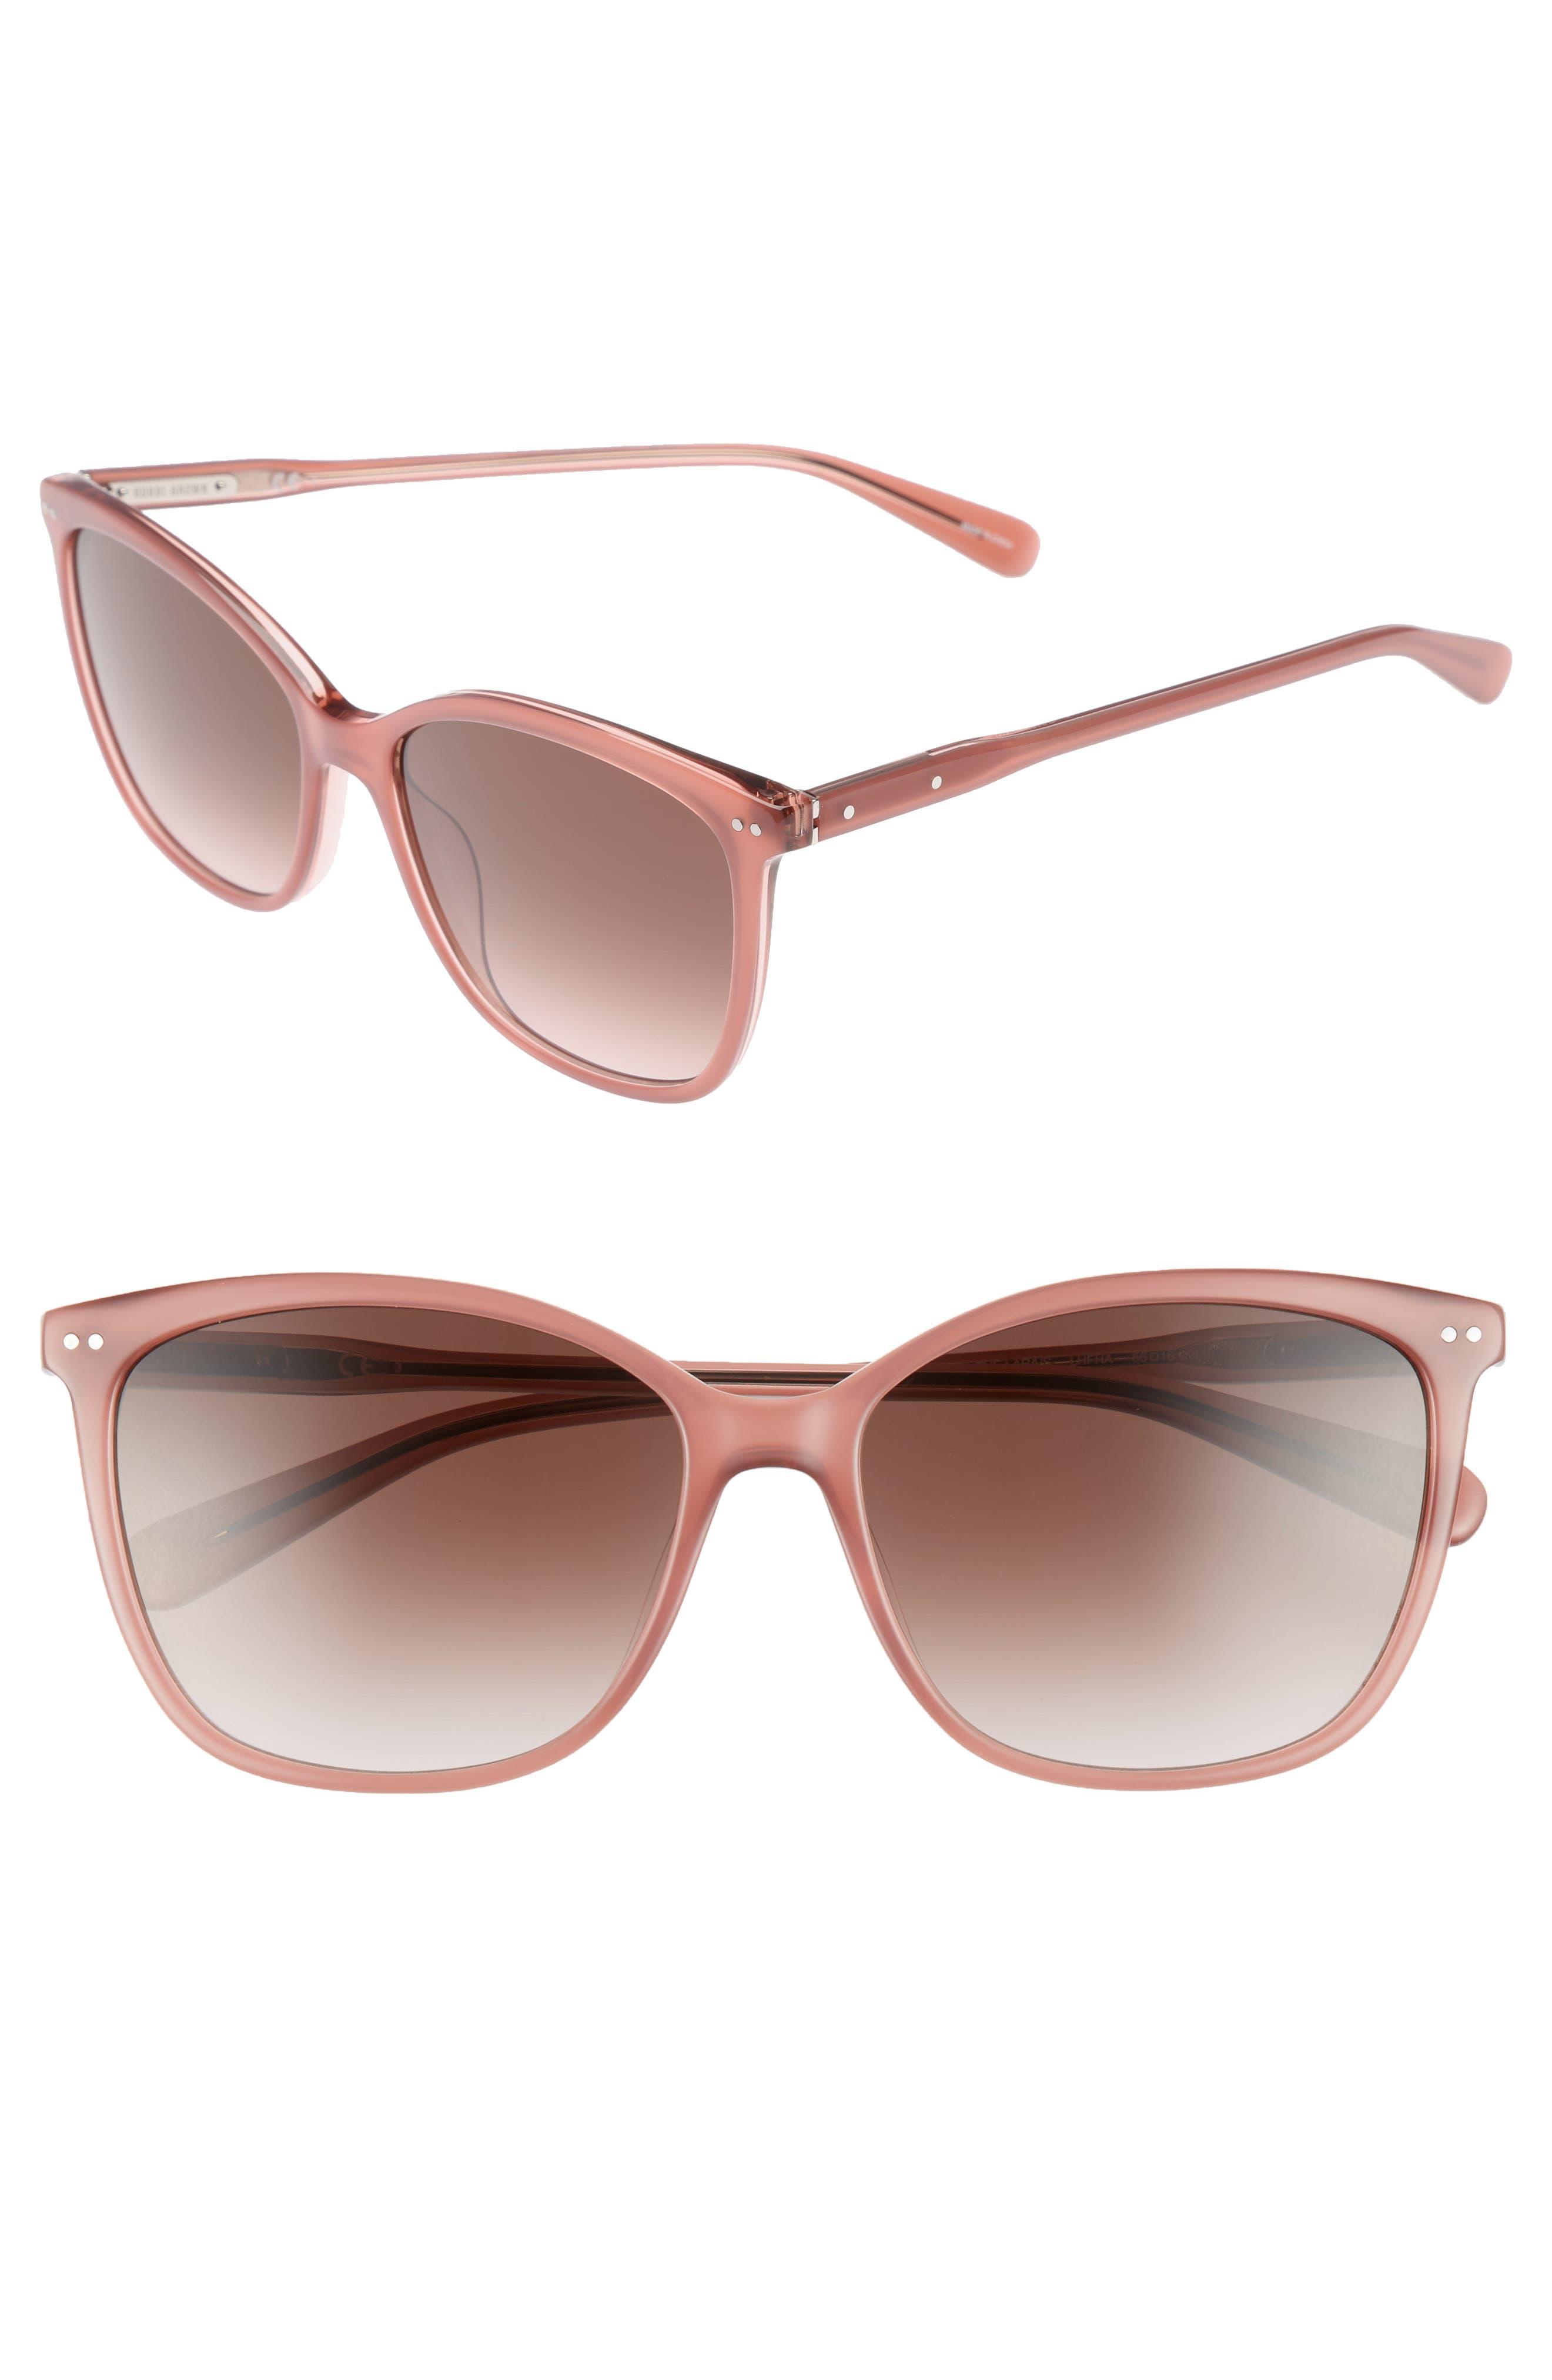 Bobbi Brown The Lara 56mm Cat Eye Sunglasses